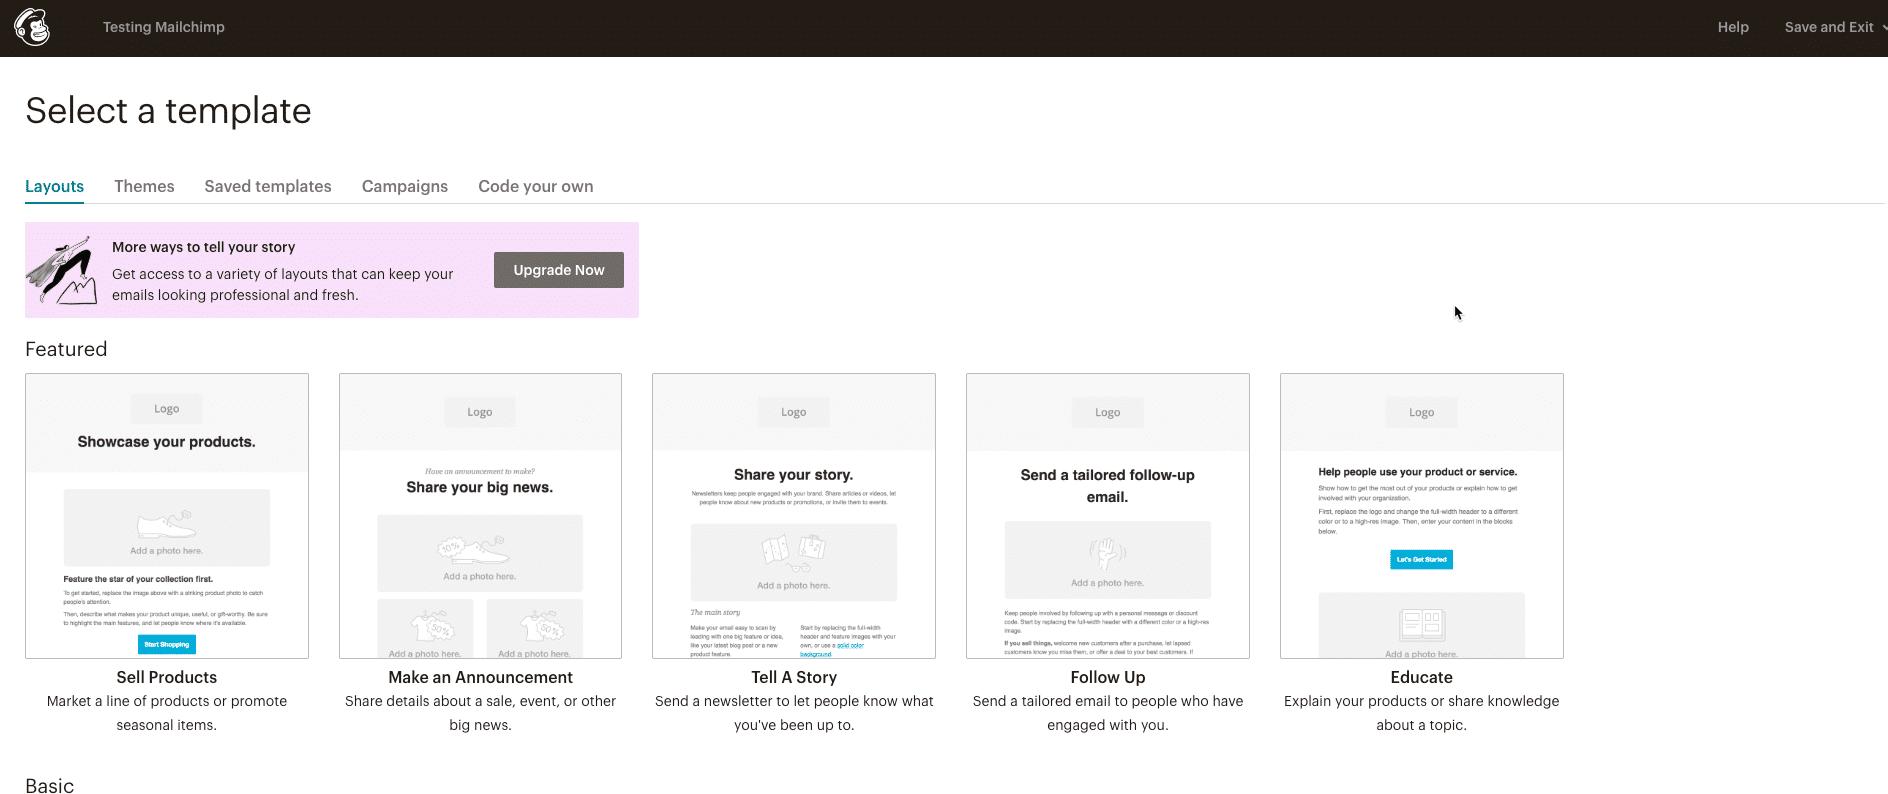 E-postlayouter i Mailchimp